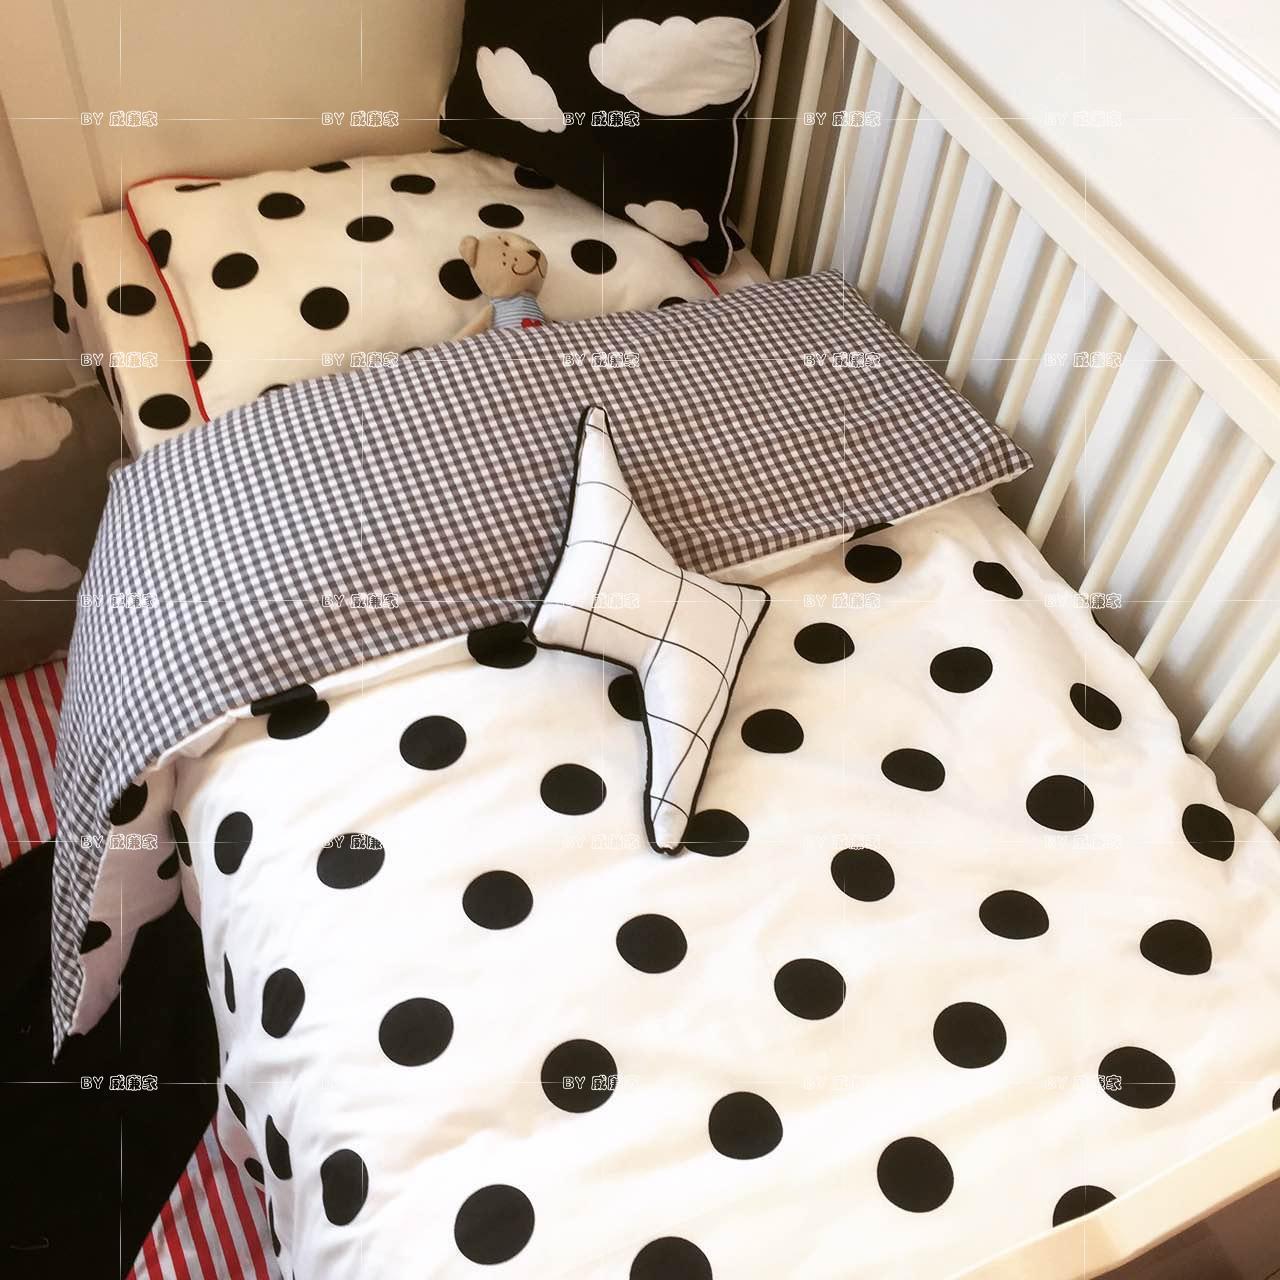 Best crib for newborn baby - 3pcs Set Black White Polka Dot Baby Bedding Set Baby Crib Cute Style Sweet Heart Fox Plaid Duck Design Best Gift Newborn Baby